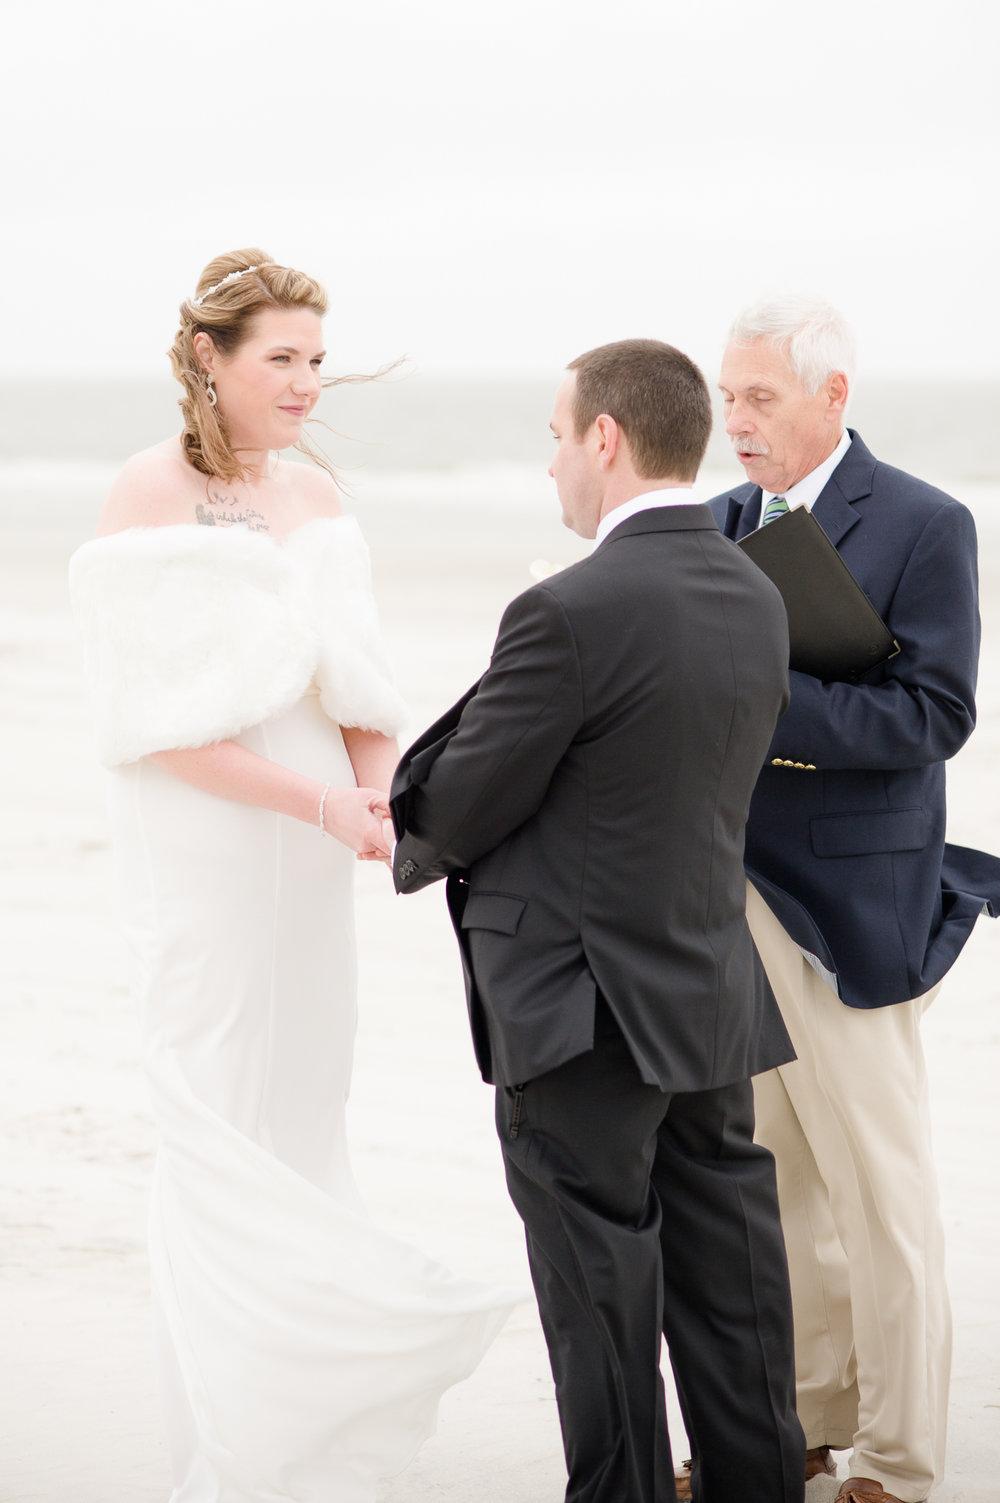 hilton+head+island+elopement-9833.JPG